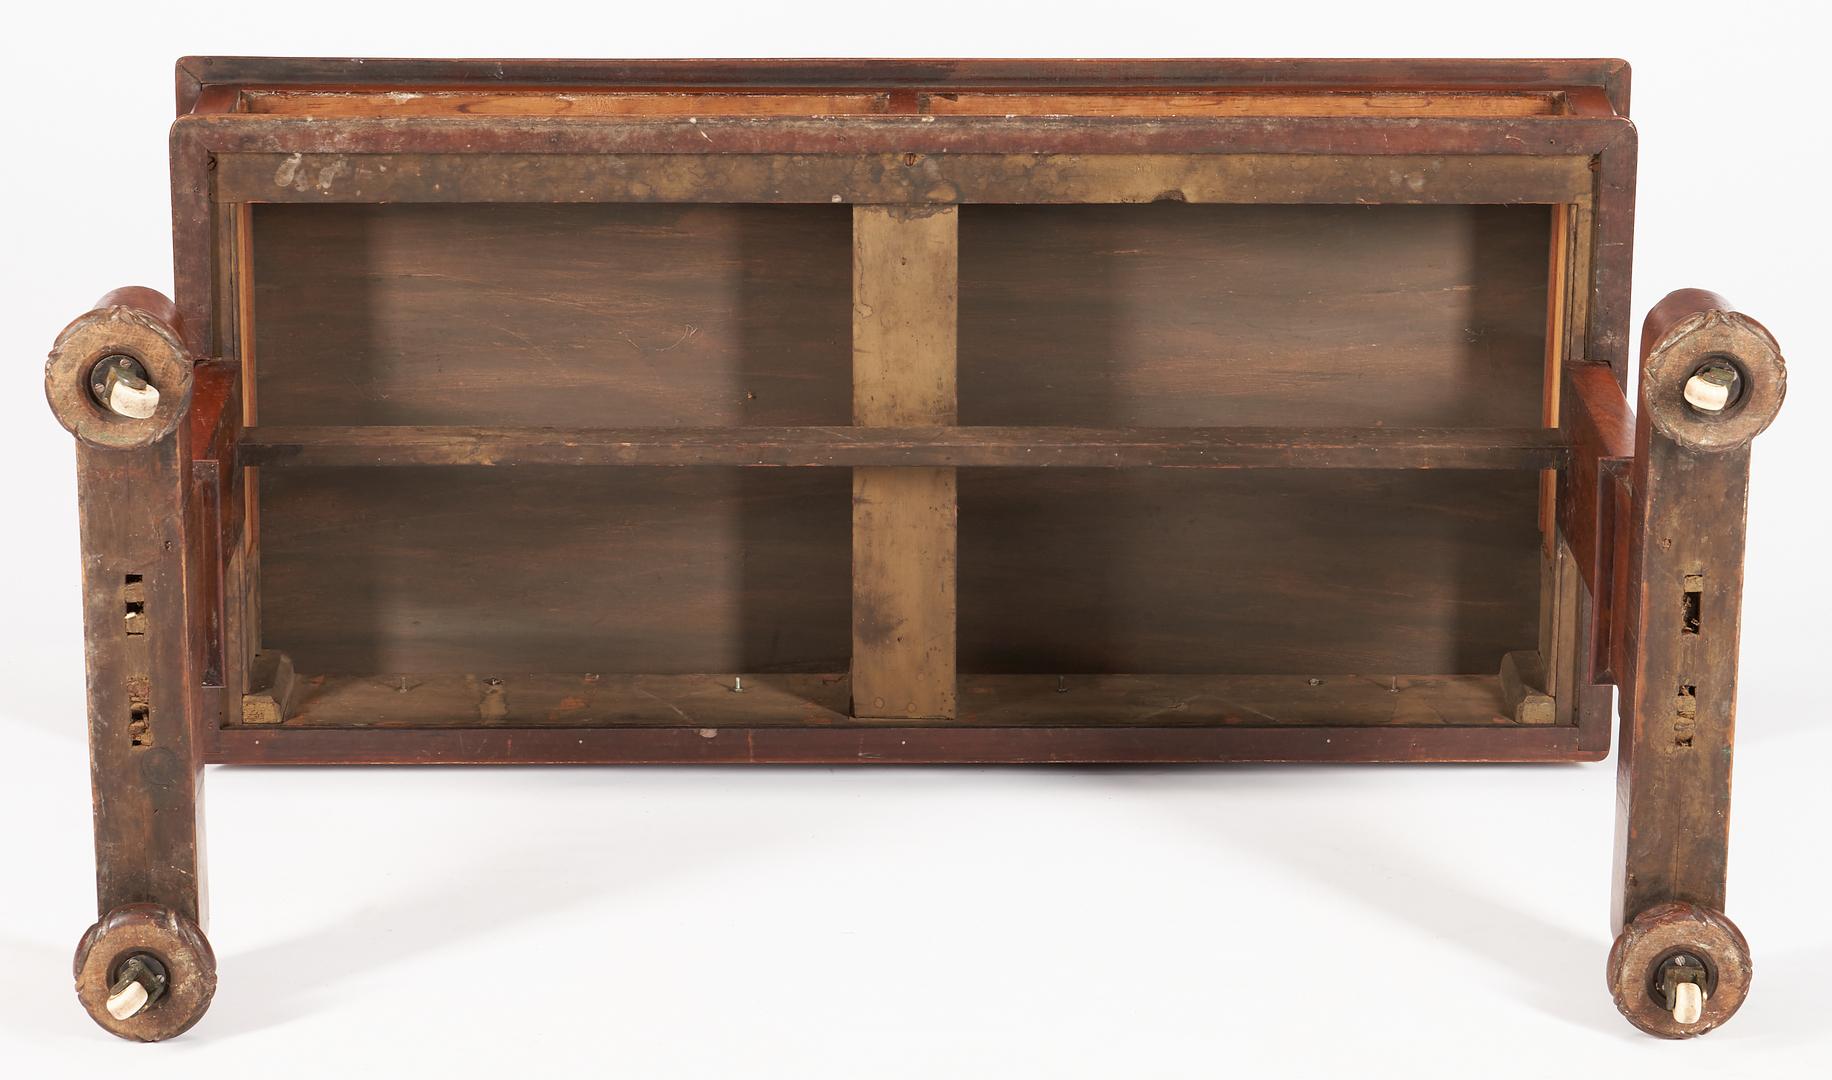 Lot 454: Regency or William IV Mahogany Writing or Sofa Table